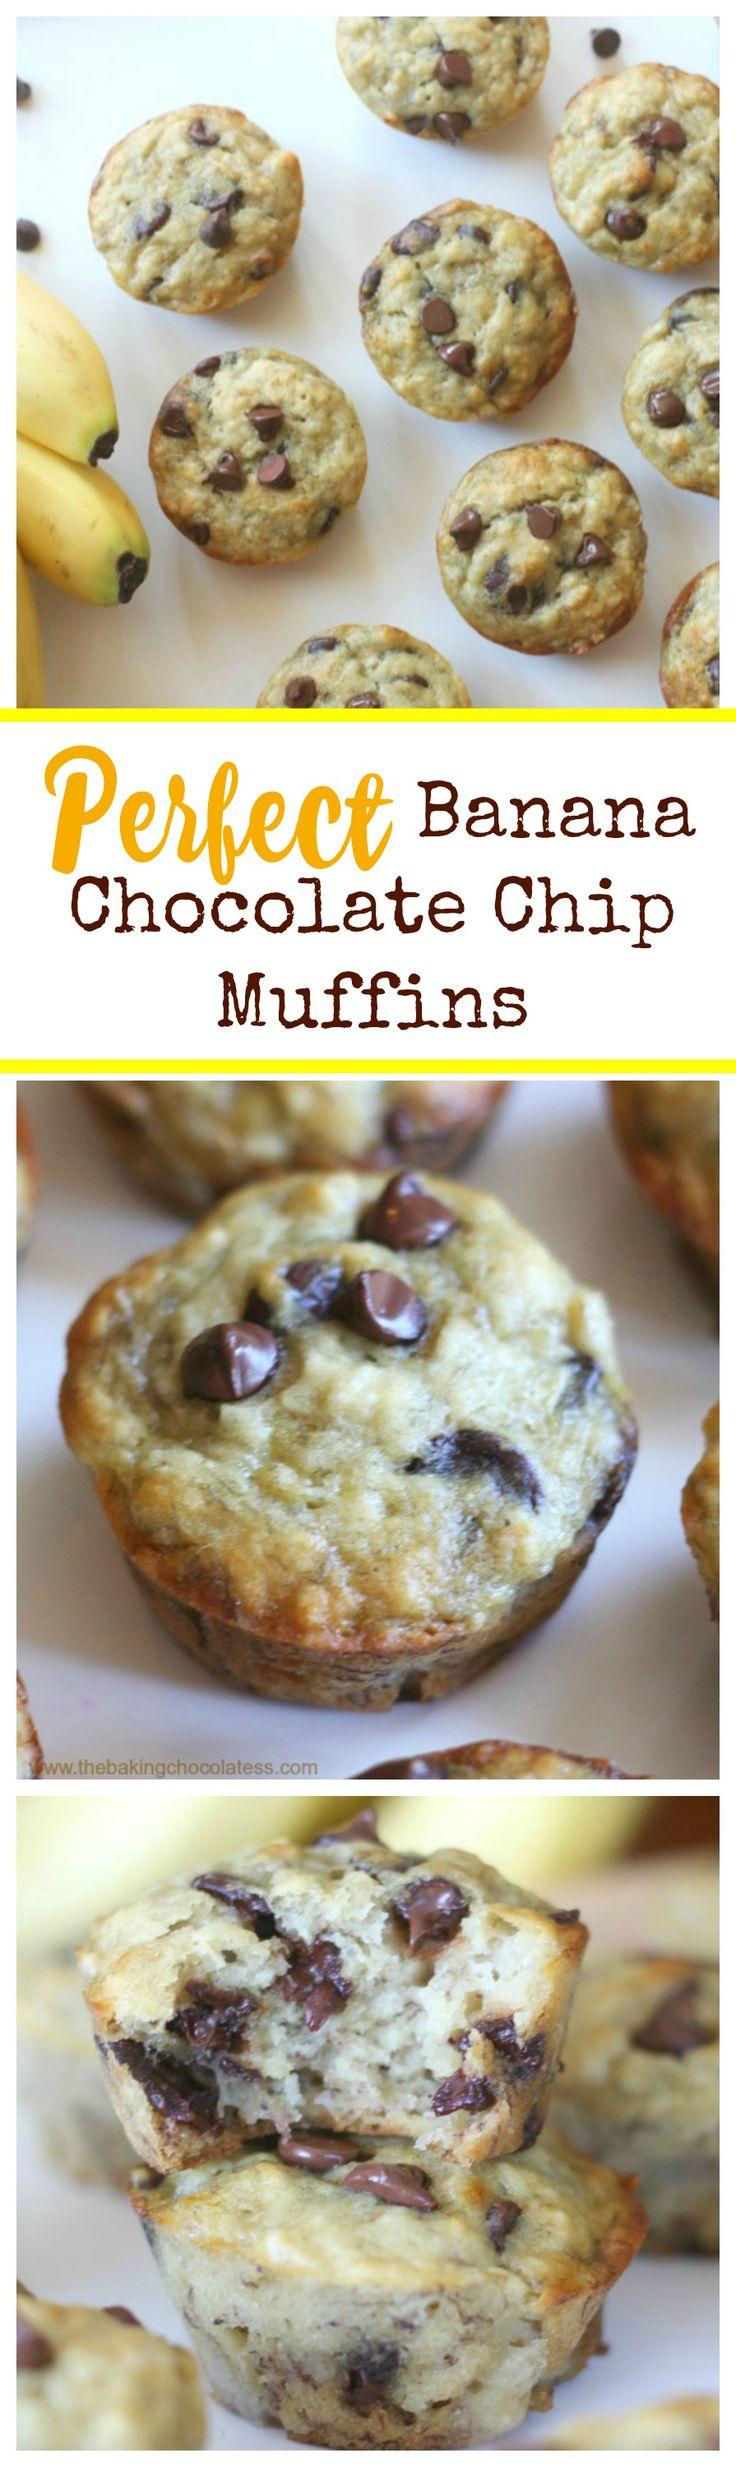 Perfect Banana Chocolate Chip Muffins!  Fluffy & Moist! via @https://www.pinterest.com/BaknChocolaTess/